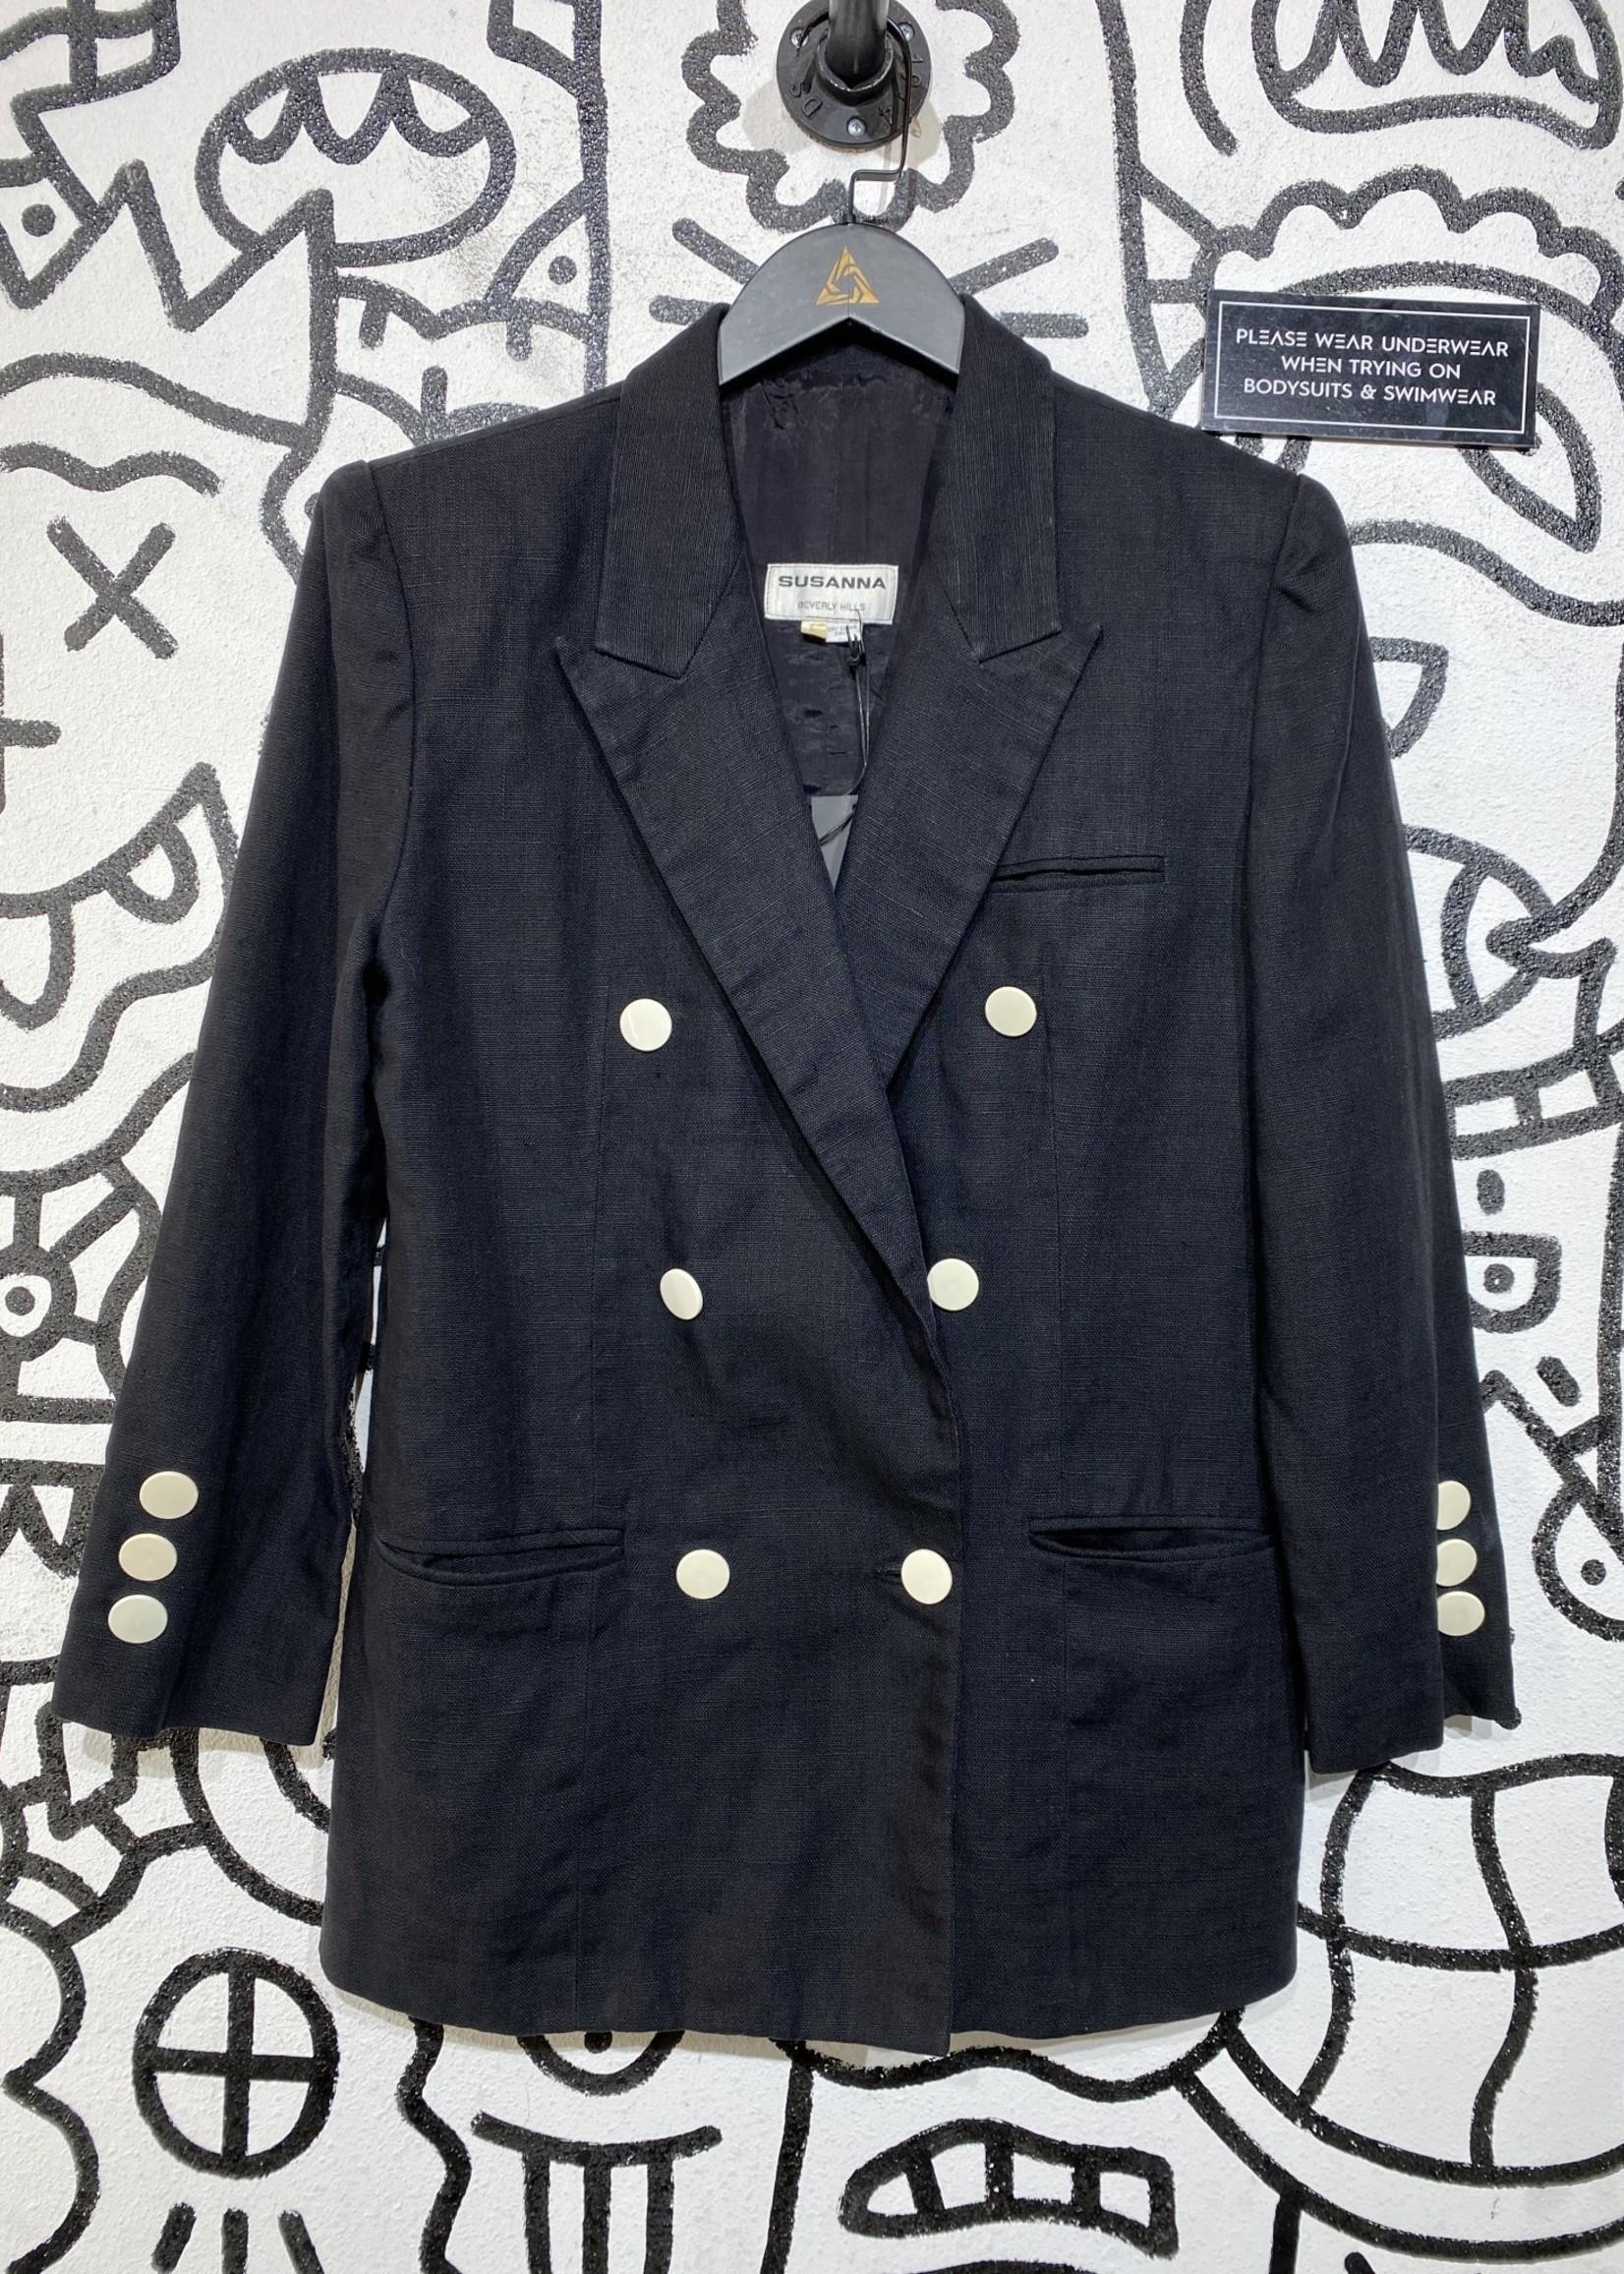 Susana Beverly Hills Vintage Black Blazer 6/M